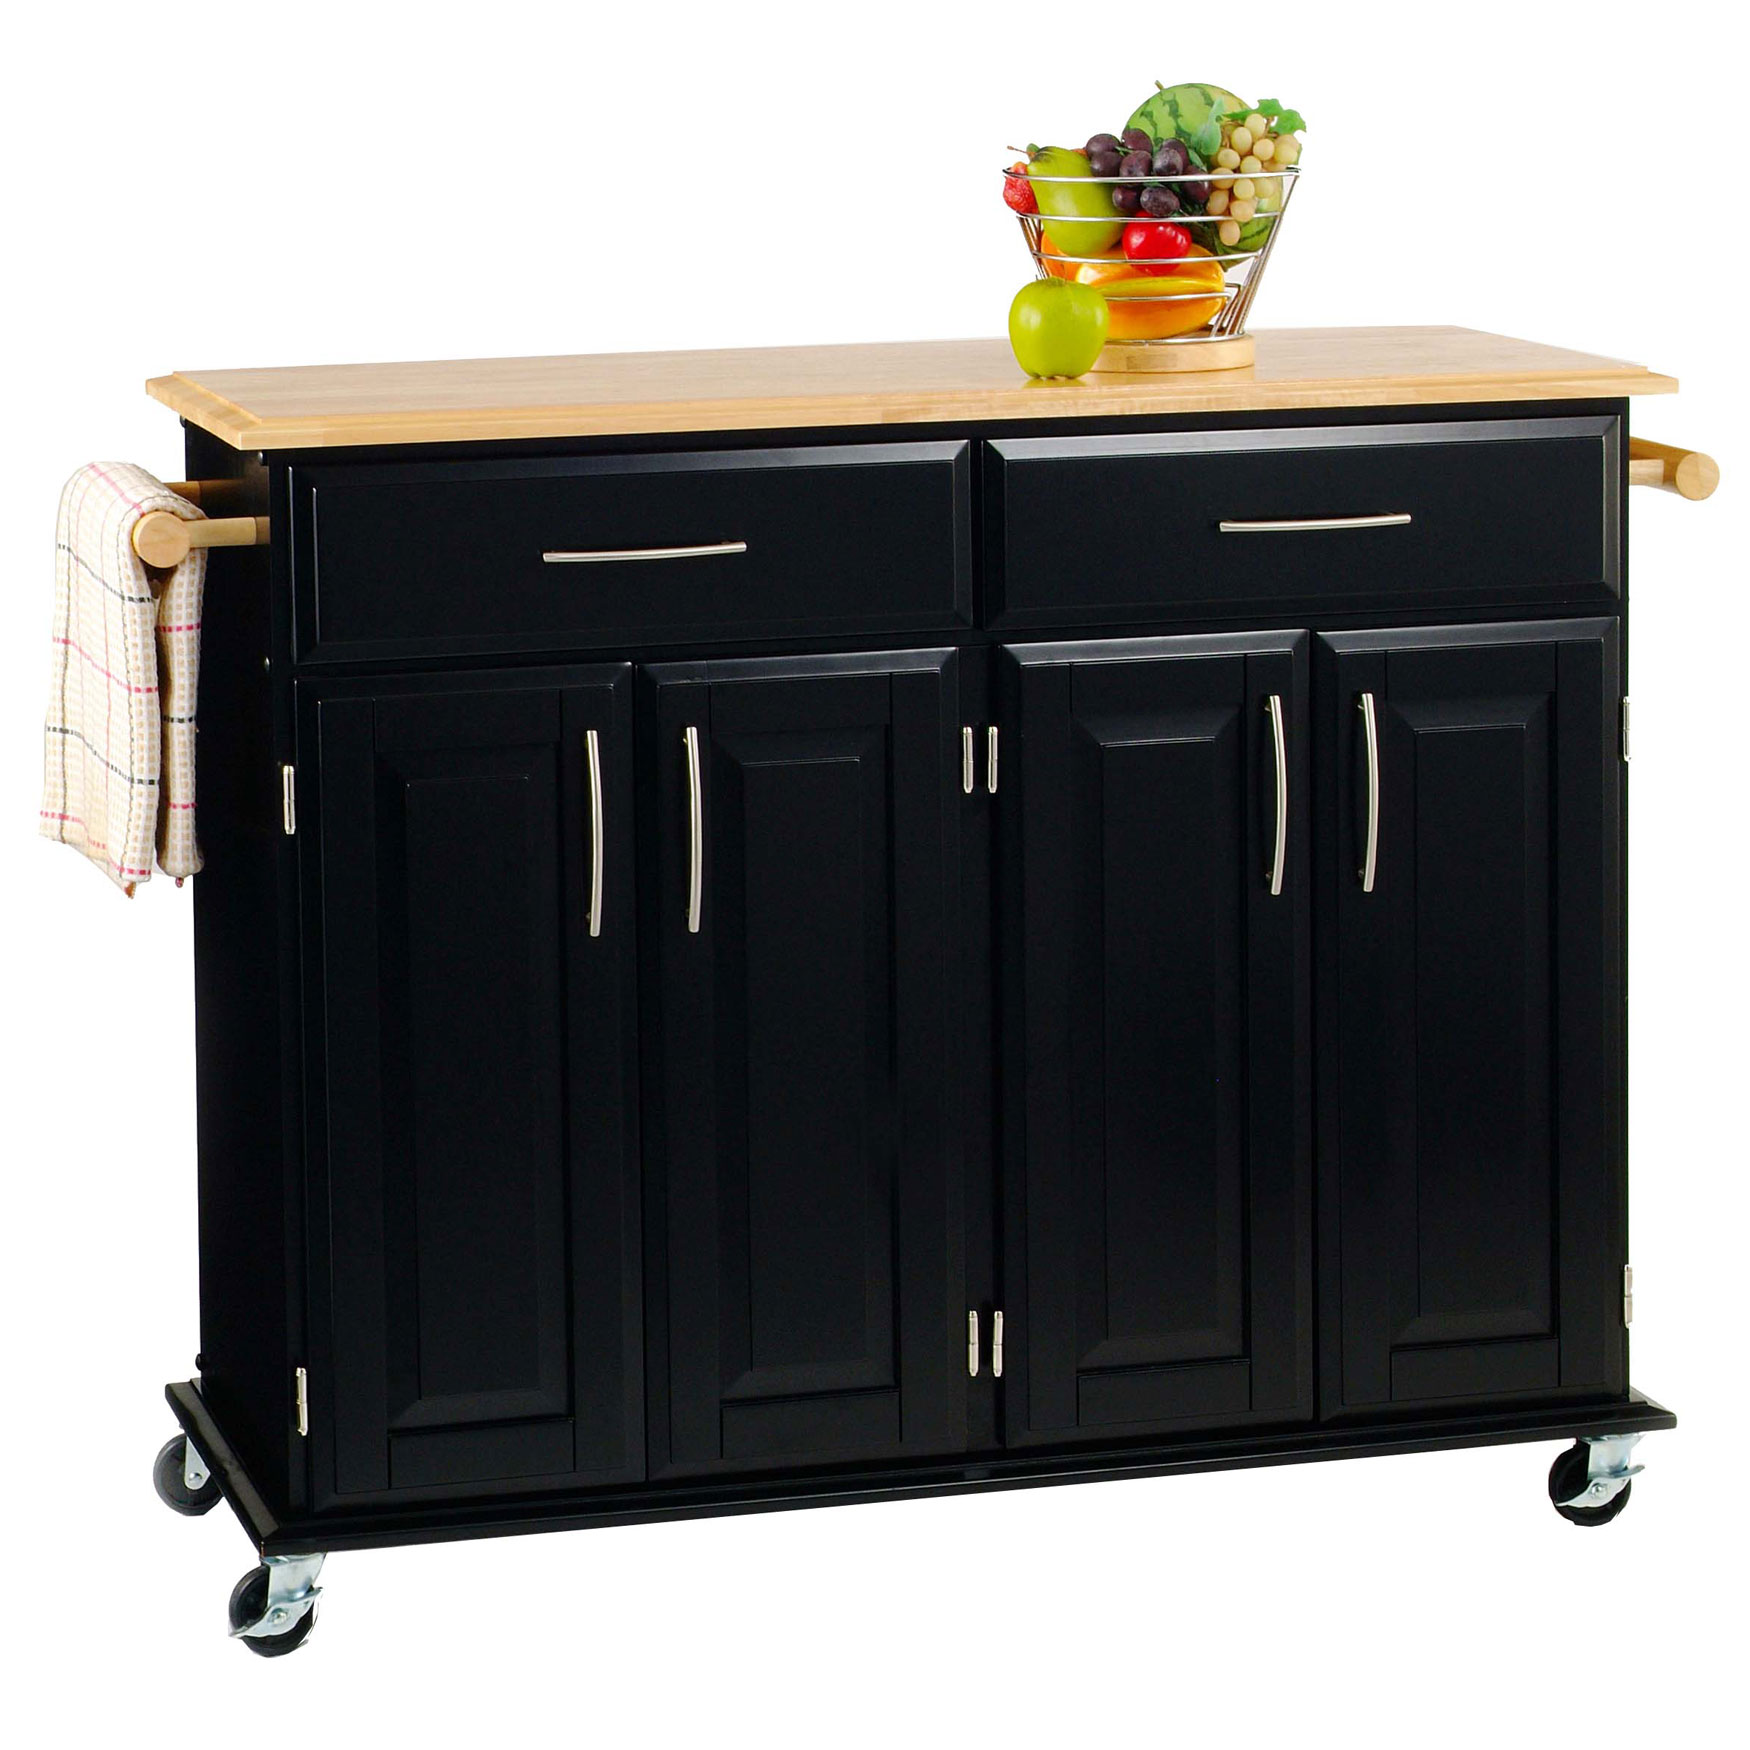 Brylane Home Kitchen: Dolly Madison Kitchen Island Cart